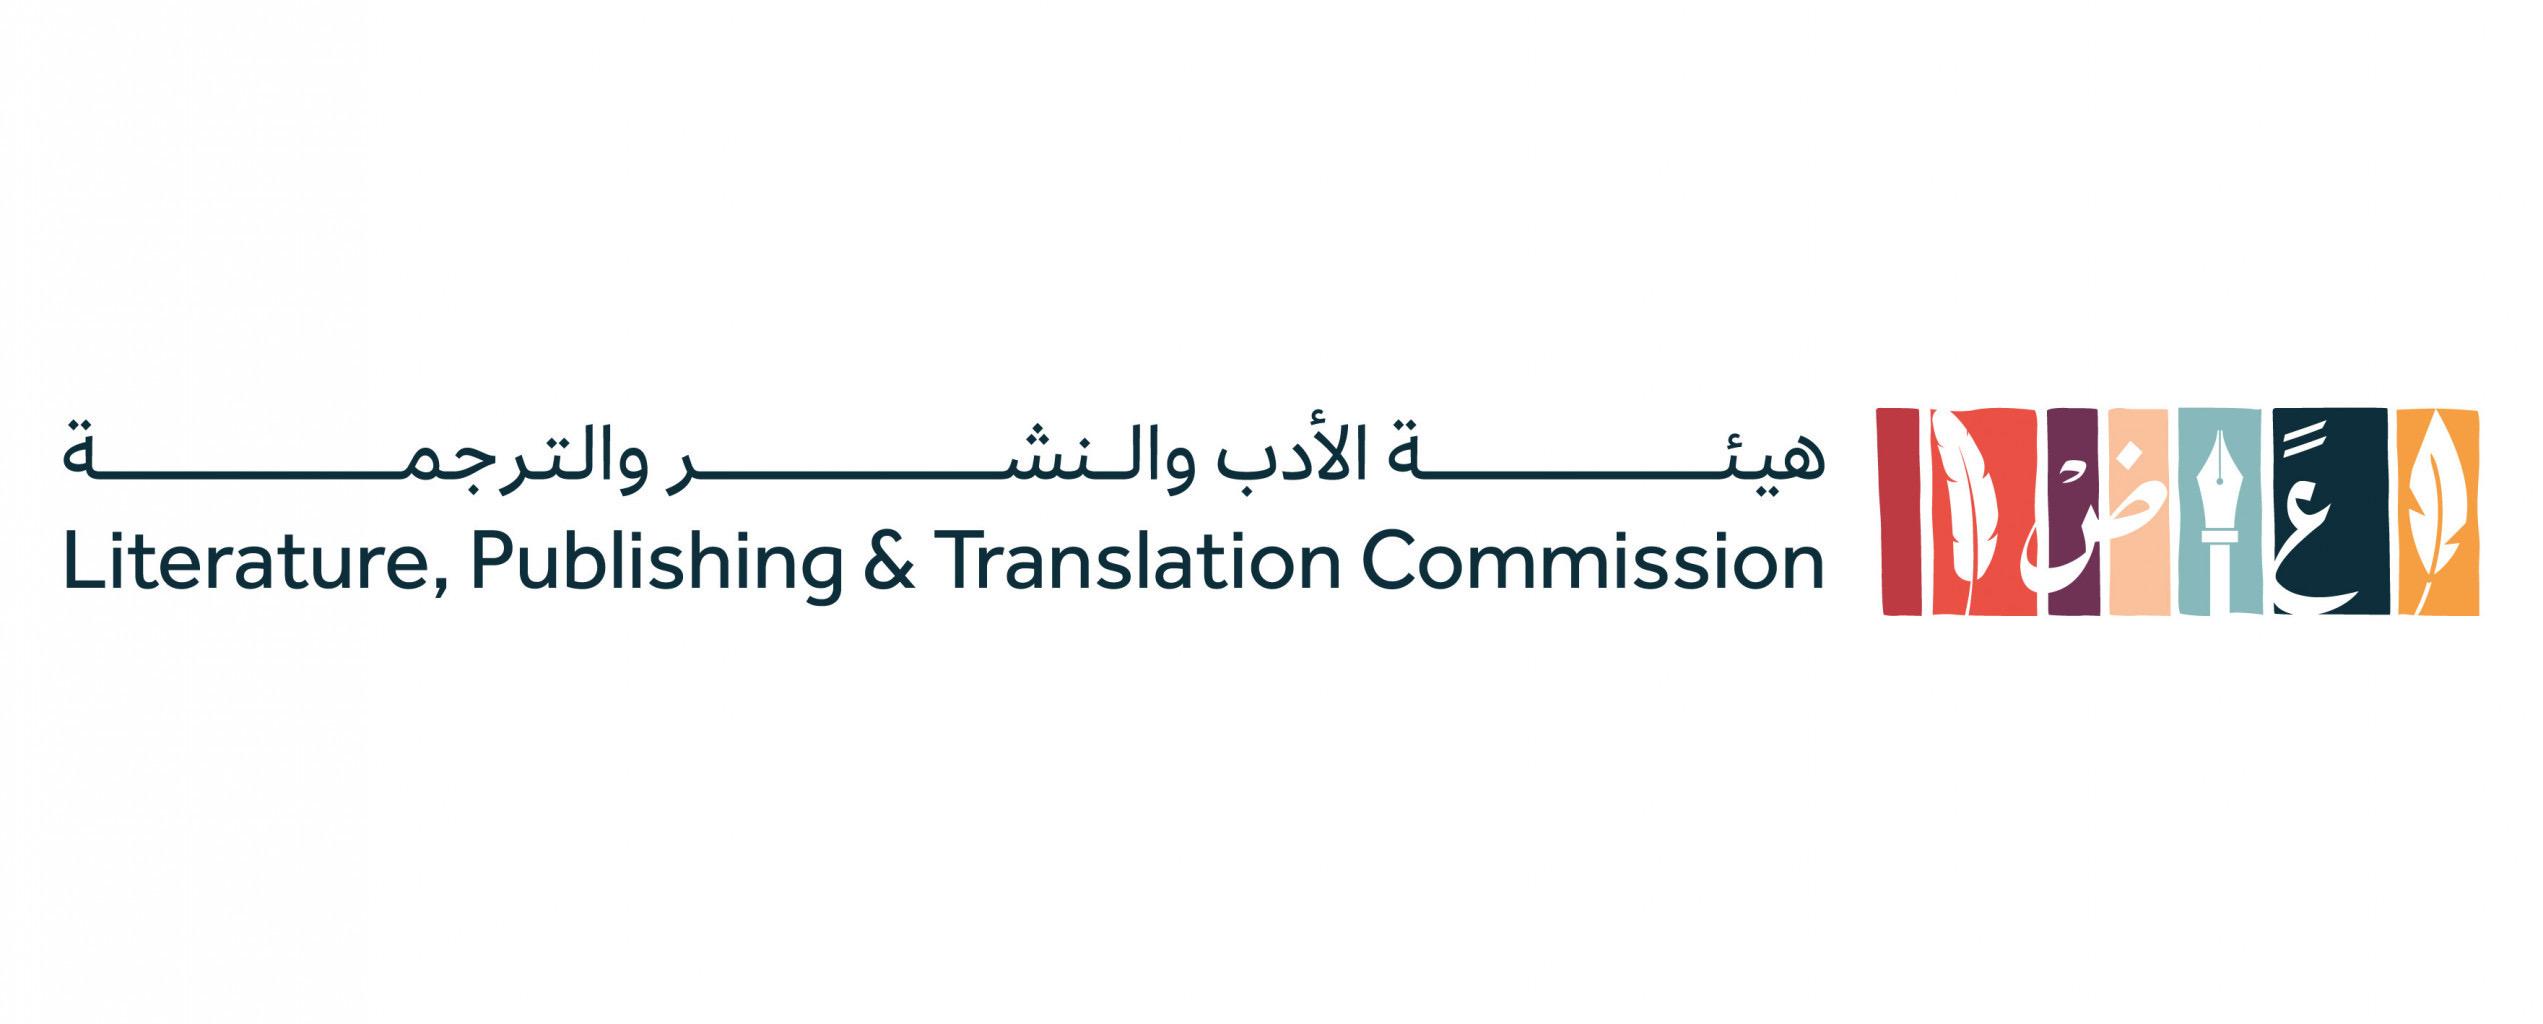 You are currently viewing أكاديميون سعوديون يشكلون هيئة الأدب والنشر والترجمة